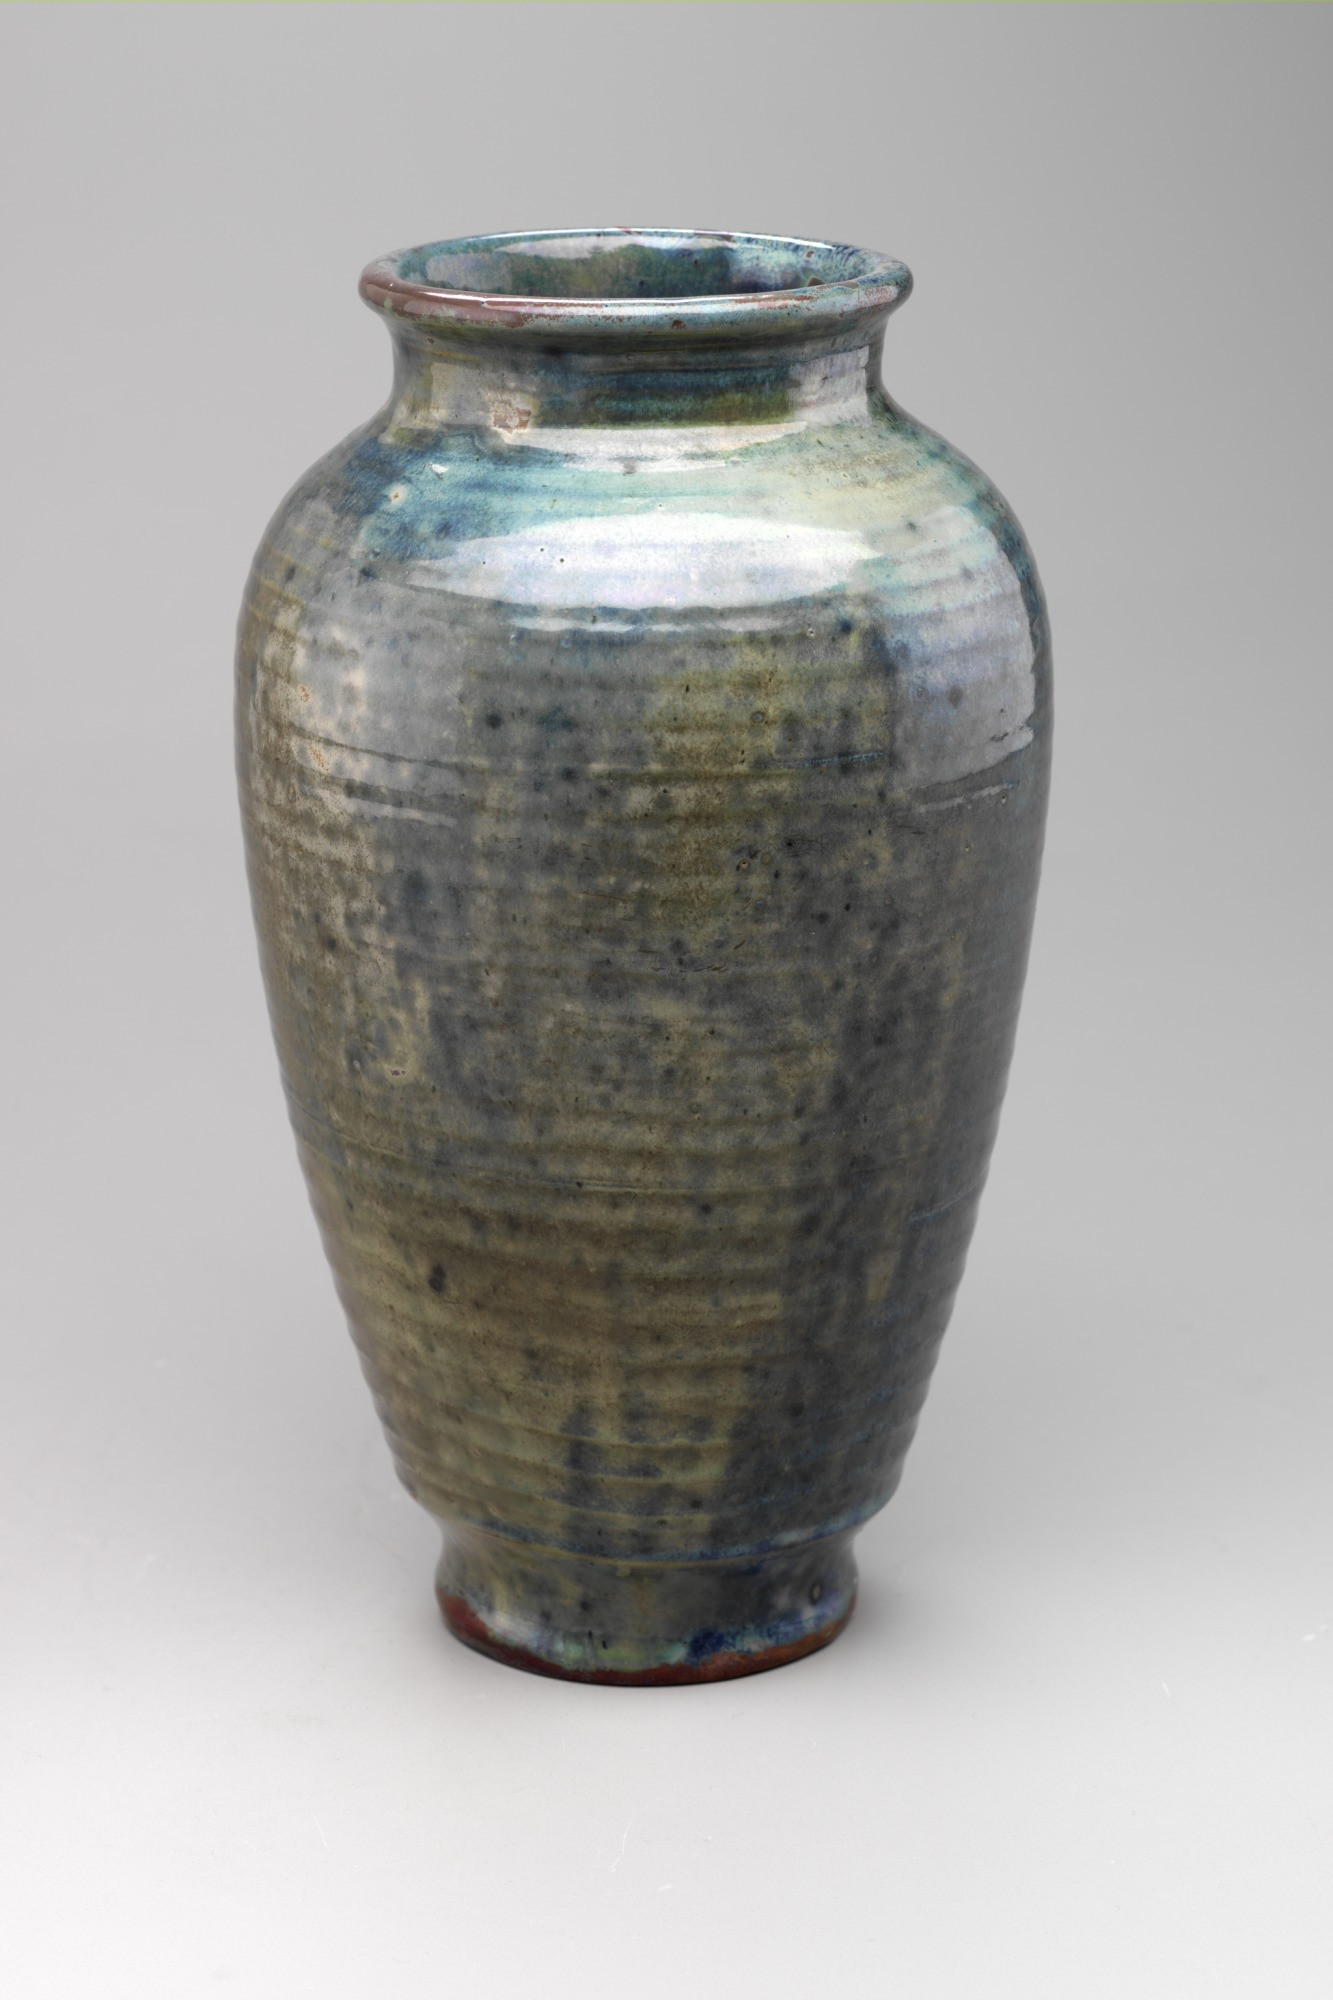 ralph lauren marion vase of vase detroit institute of arts museum regarding mary chase perry stratton vase 1918 glazed earthenware detroit institute of arts